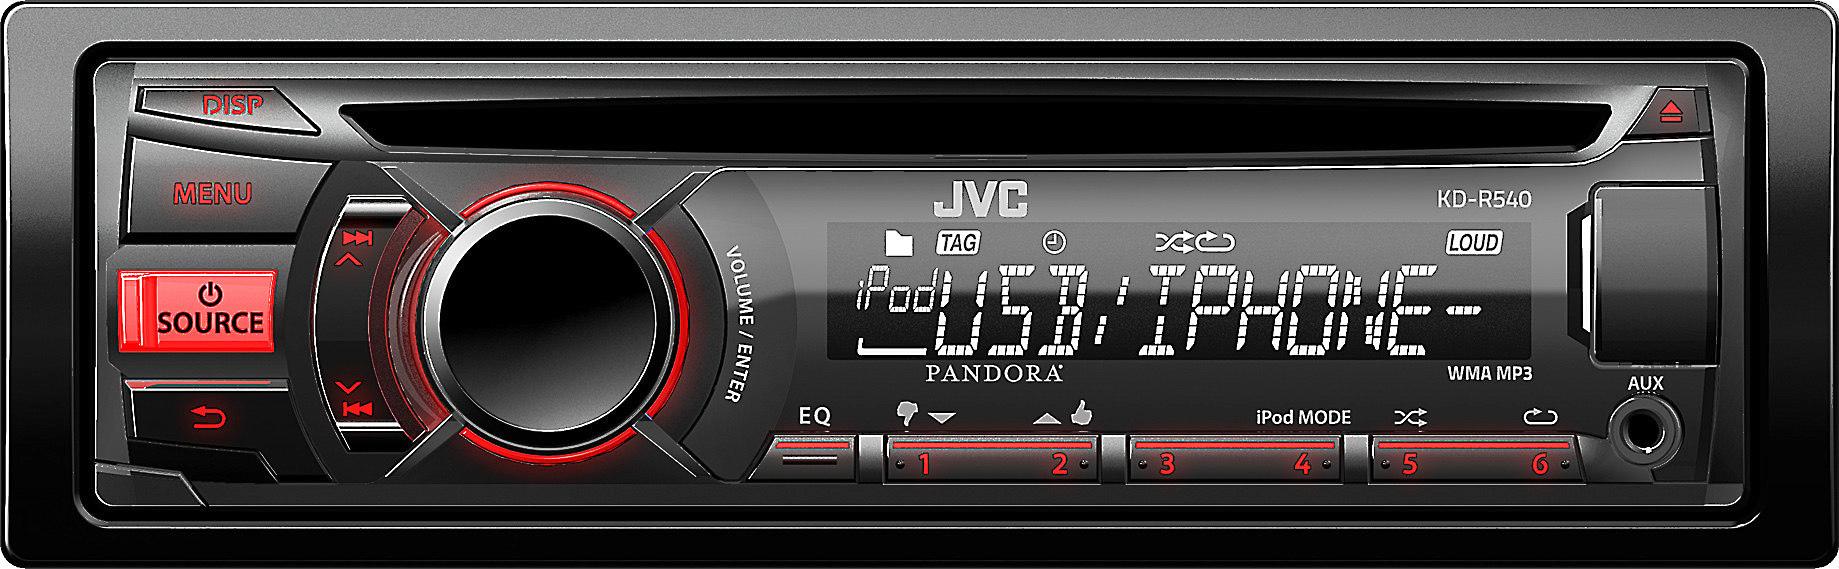 hight resolution of jvc kd r540 cd receiver at crutchfield jvc kd r540 wiring diagram